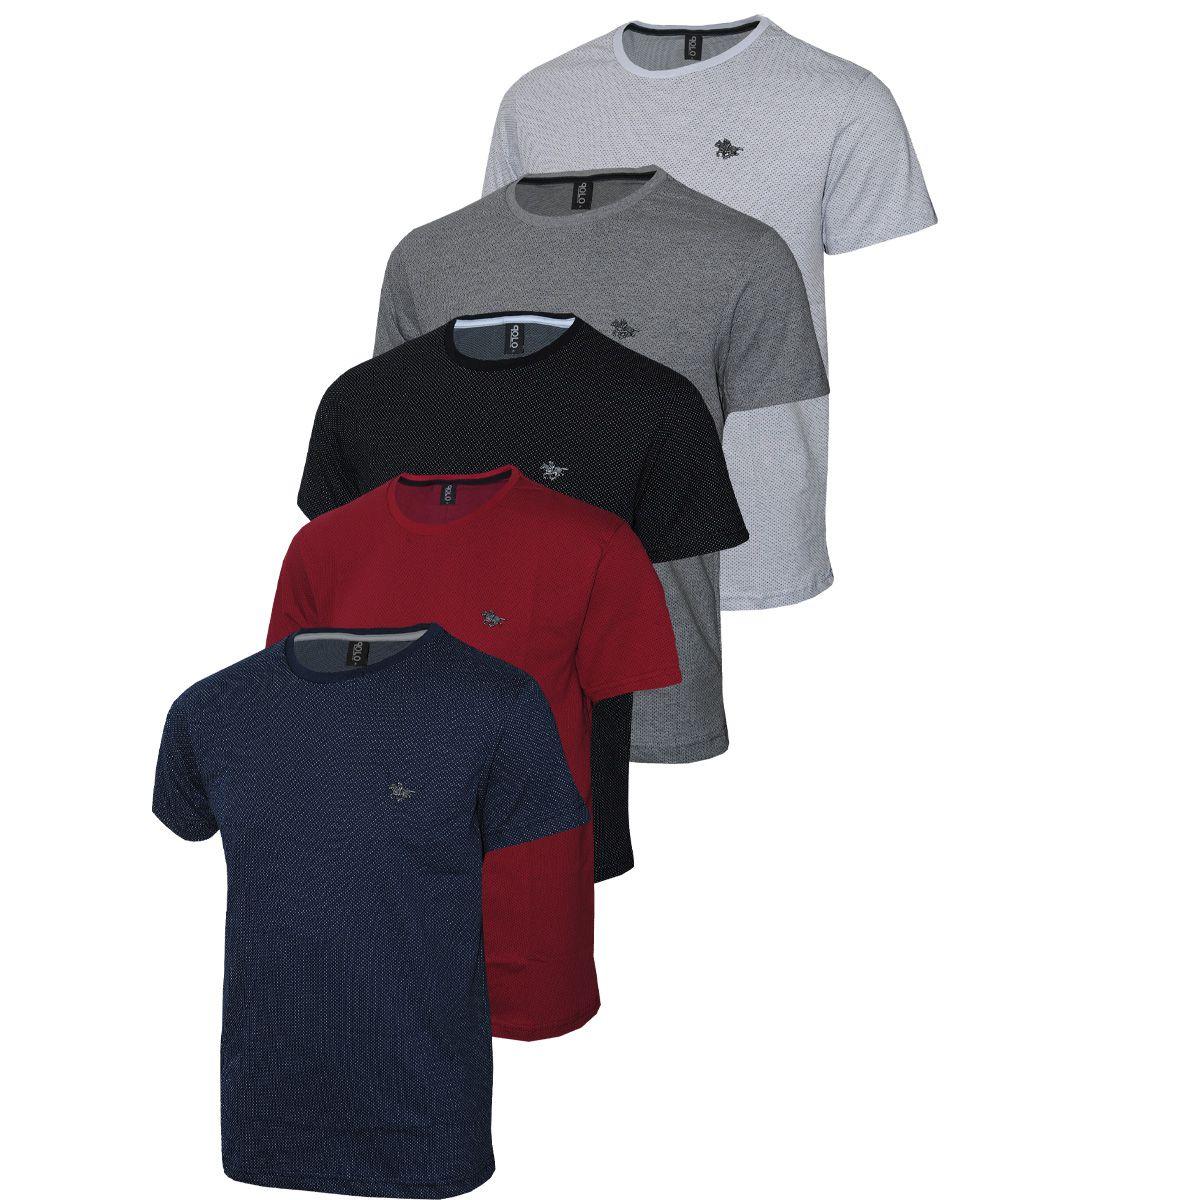 Camiseta Plus Size Kit com 05 logo Metalizado